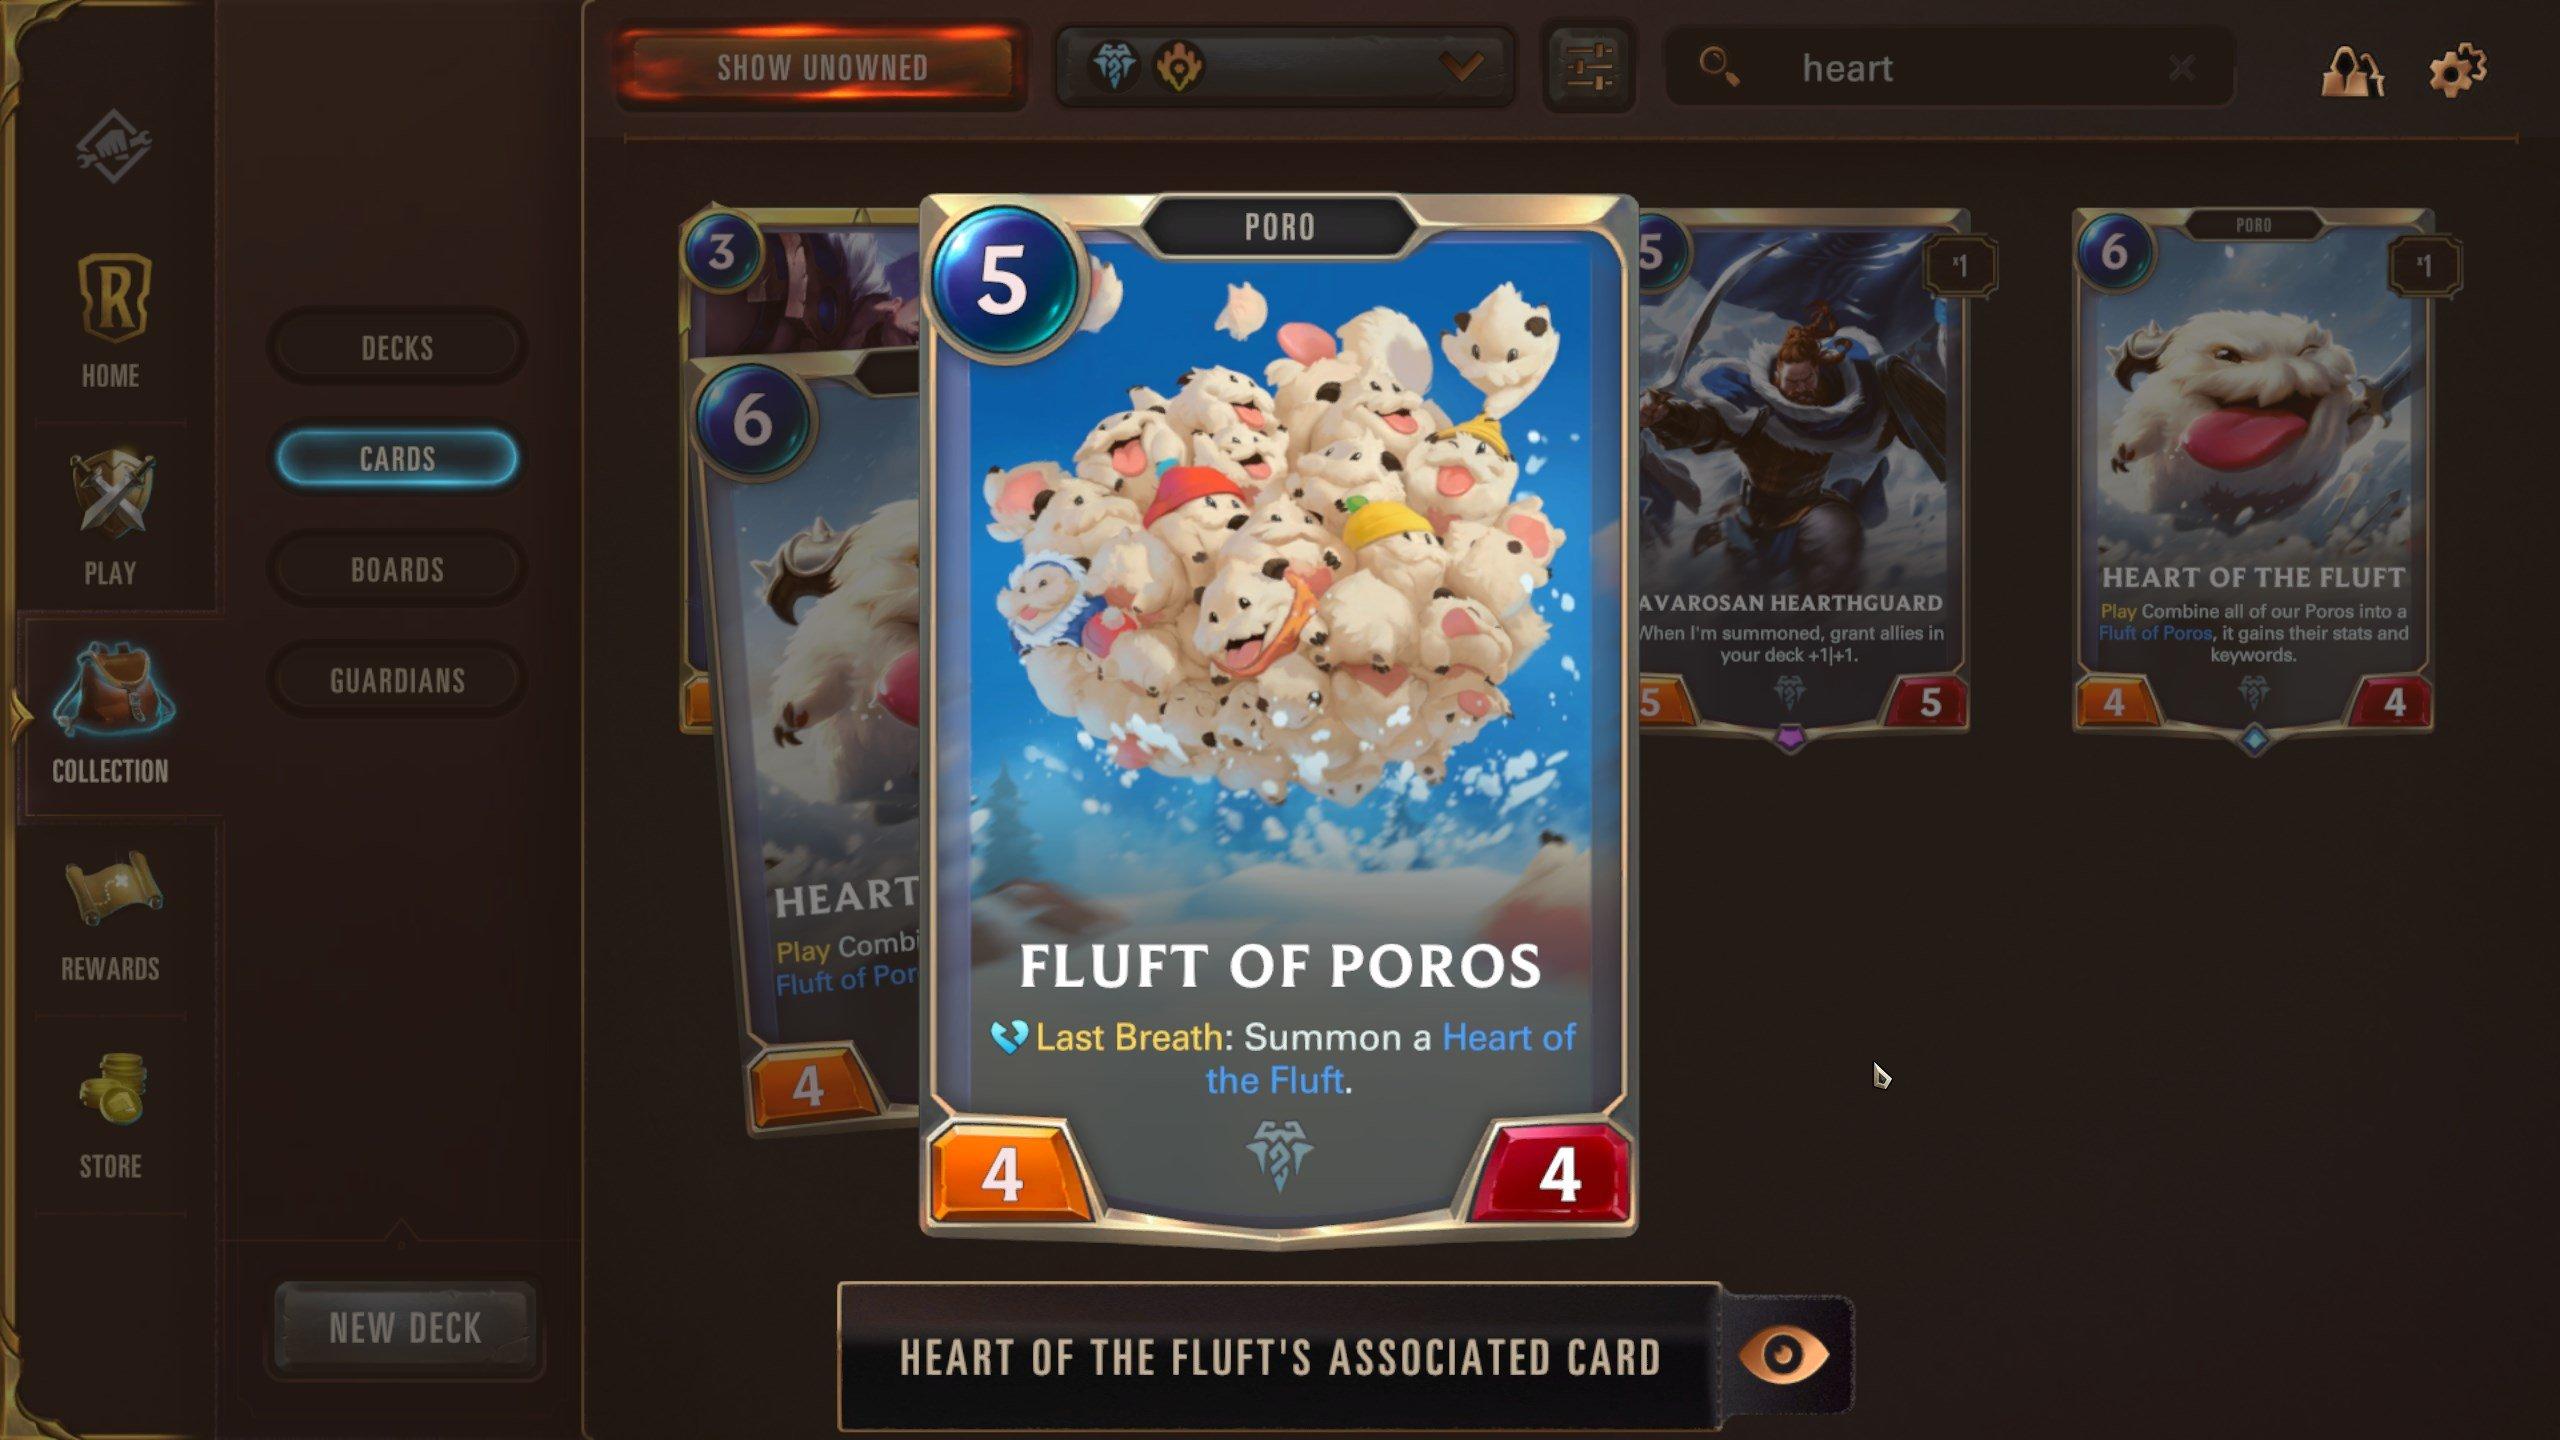 Fluft of Poros - Legends of Runeterra